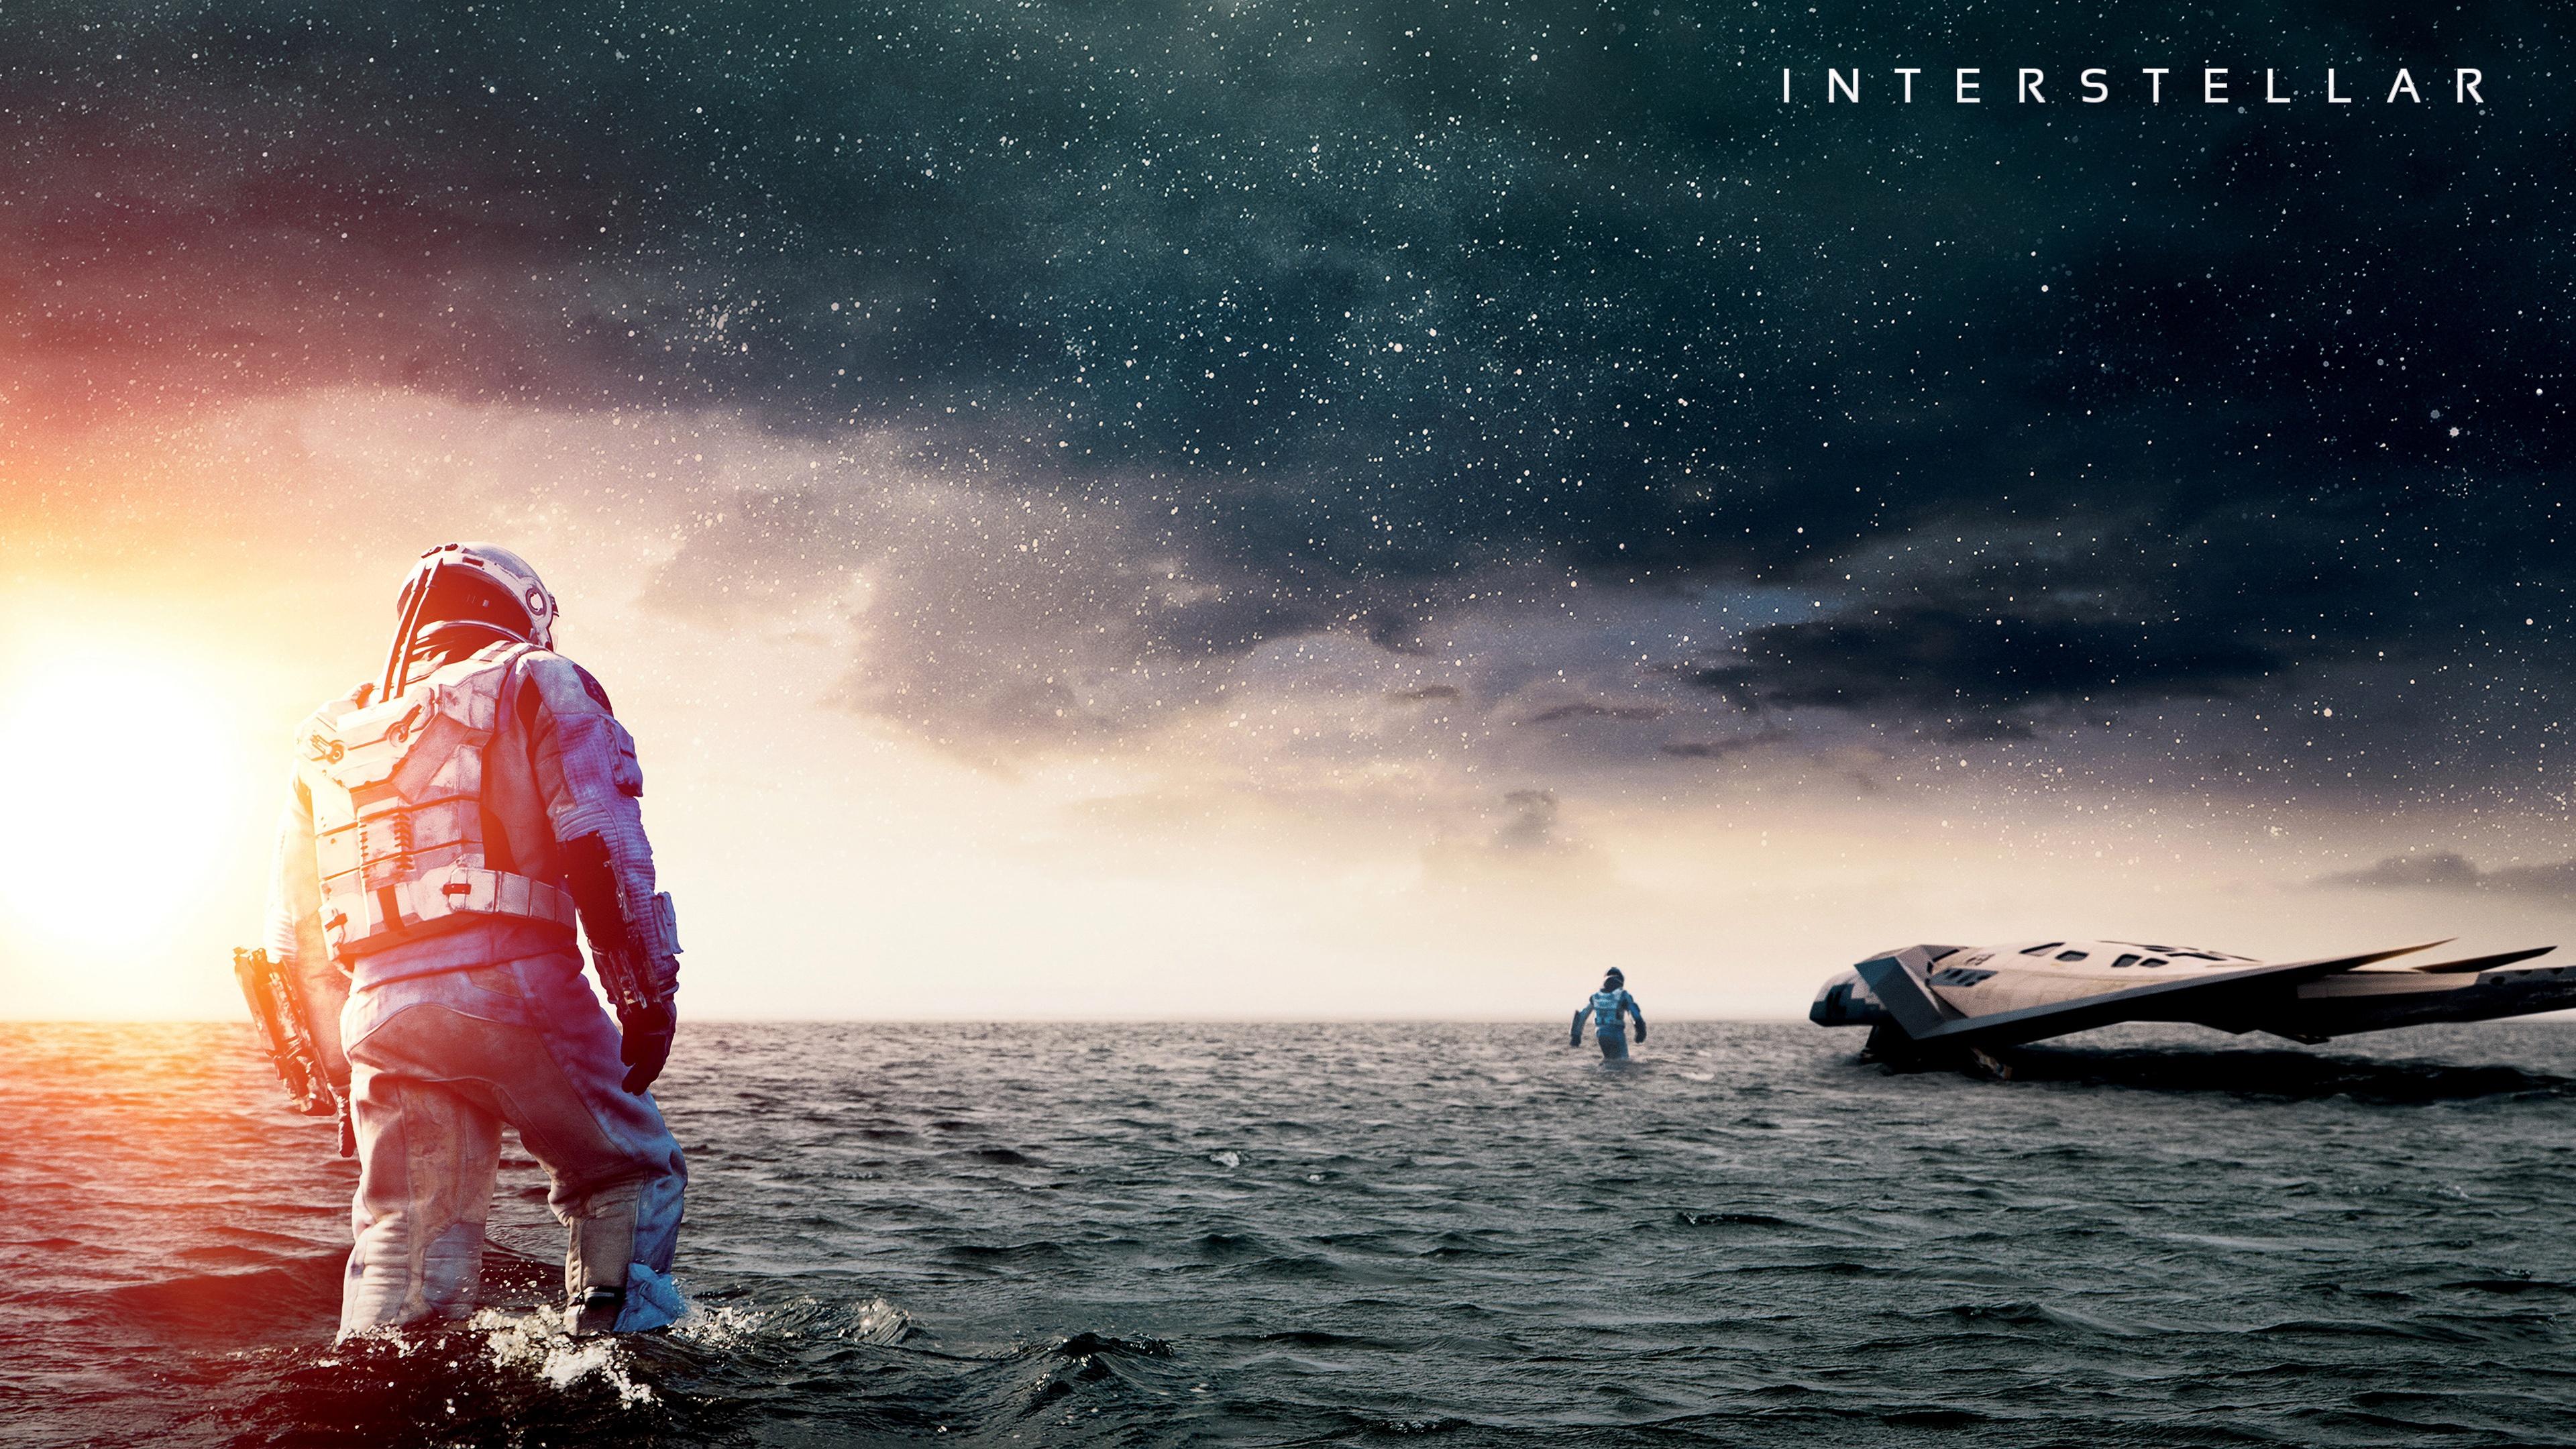 Film Interstellar, pembuka wacana   Interstellar